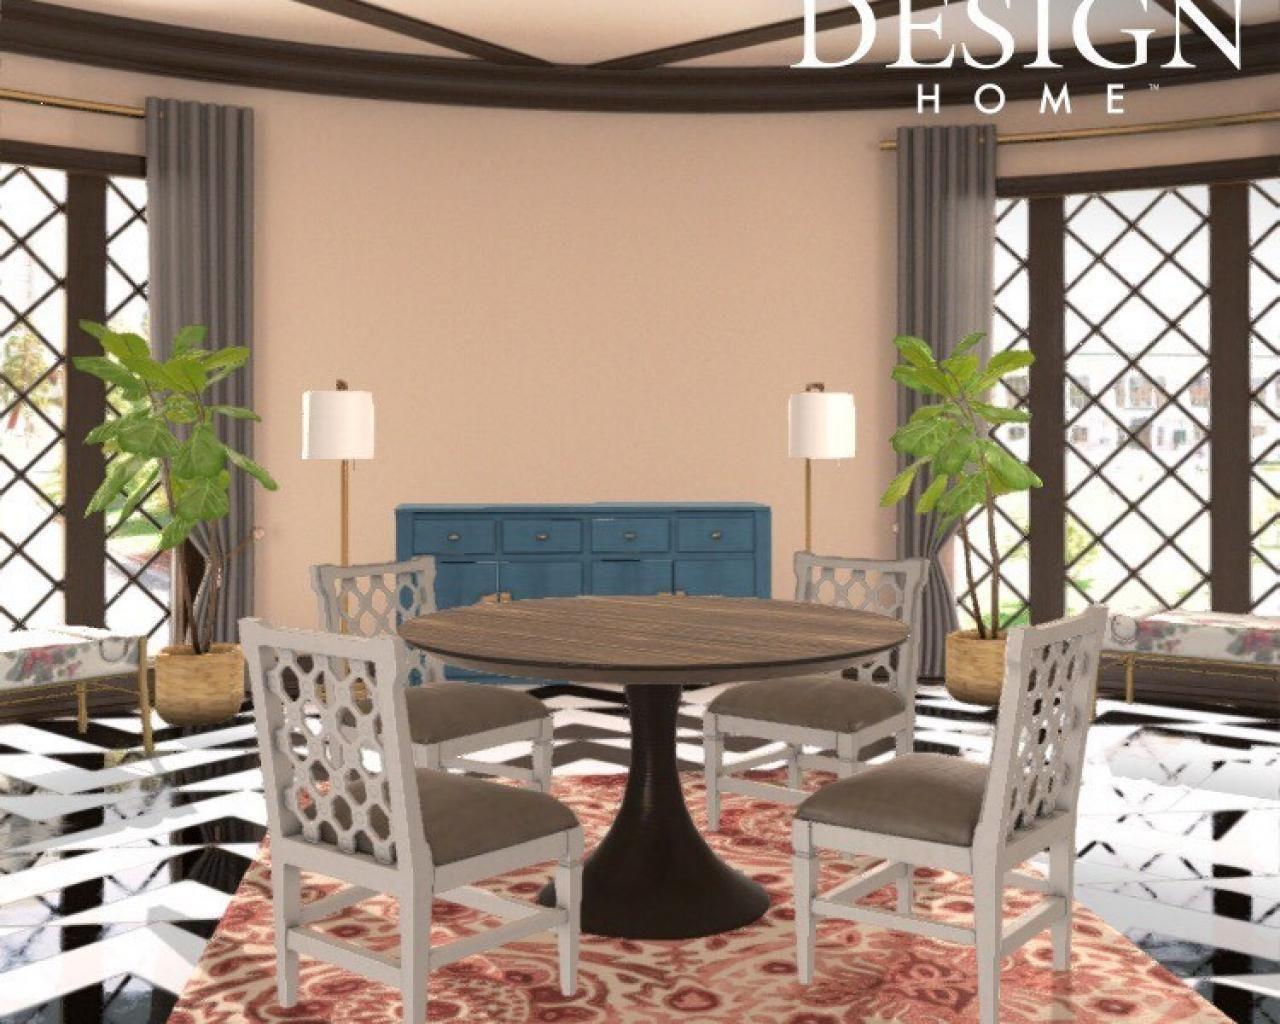 Interior Design From Home #Badezimmer #Büromöbel #Couchtisch #Deko ...